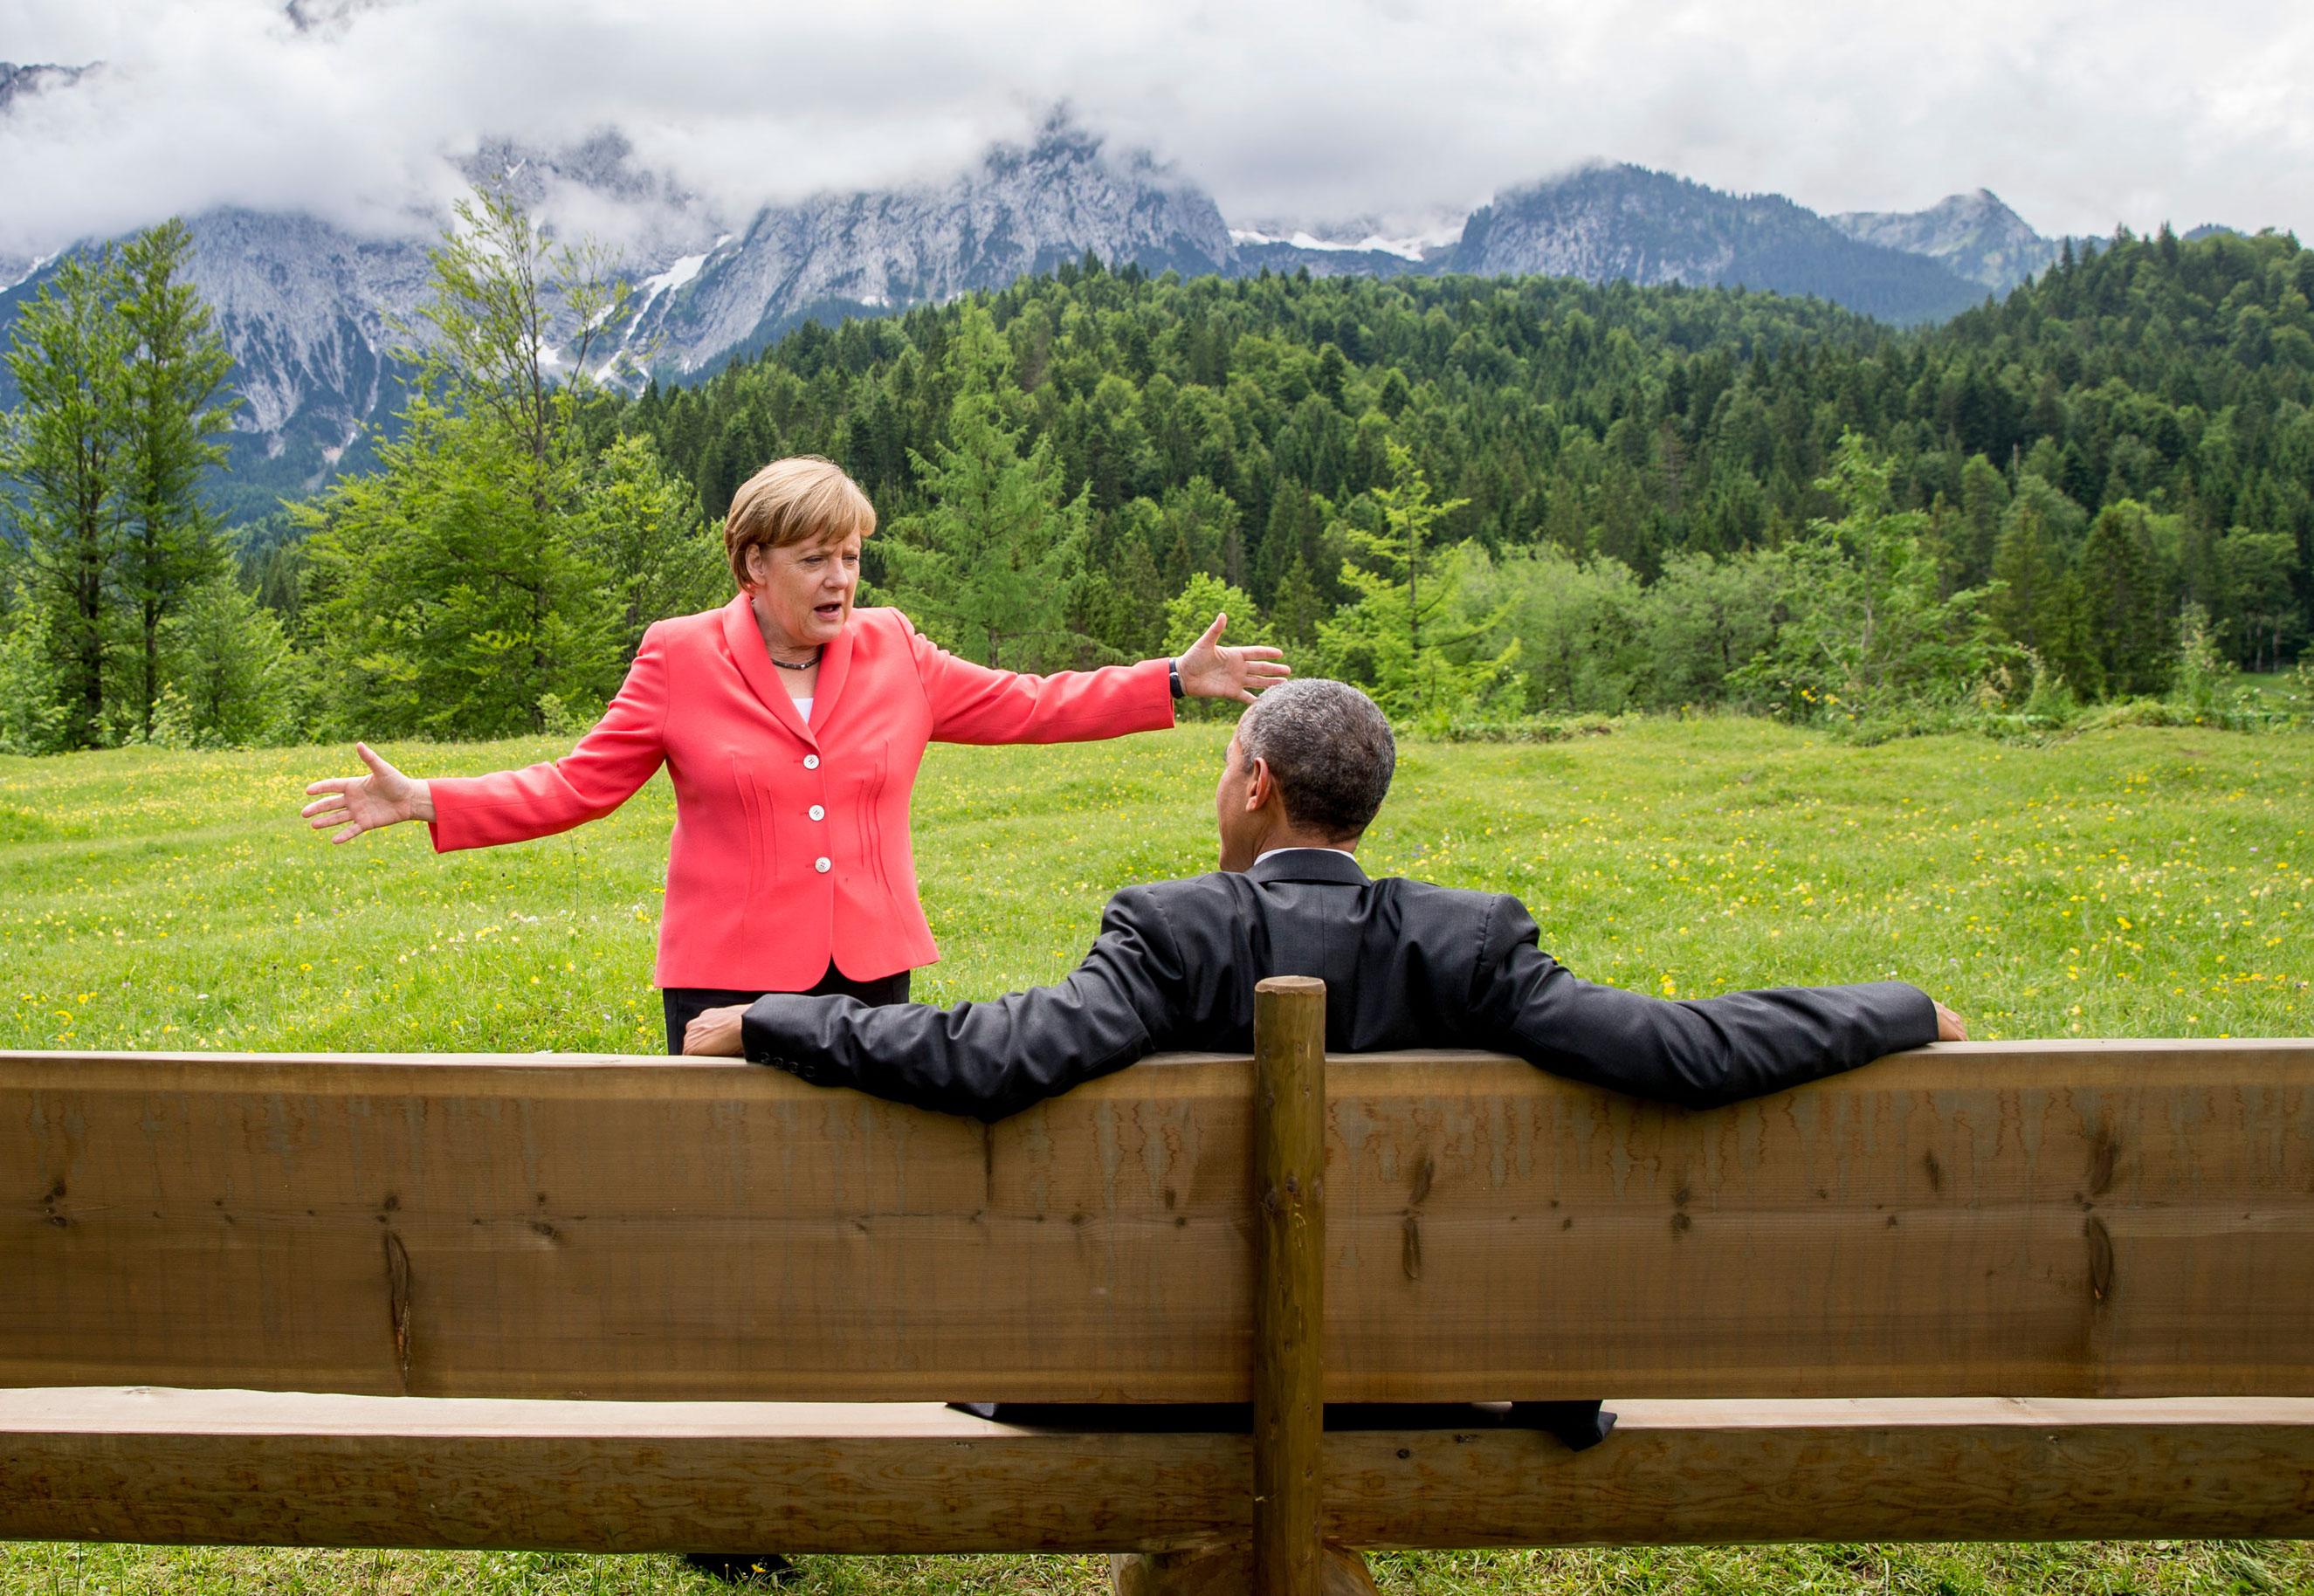 June: Chancellor Angela Merkel speaks with U.S. President Barack Obama outside the Elmau castle in Kruen near Garmisch-Partenkirchen, Germany on June 8, 2015 during the G7 summit.